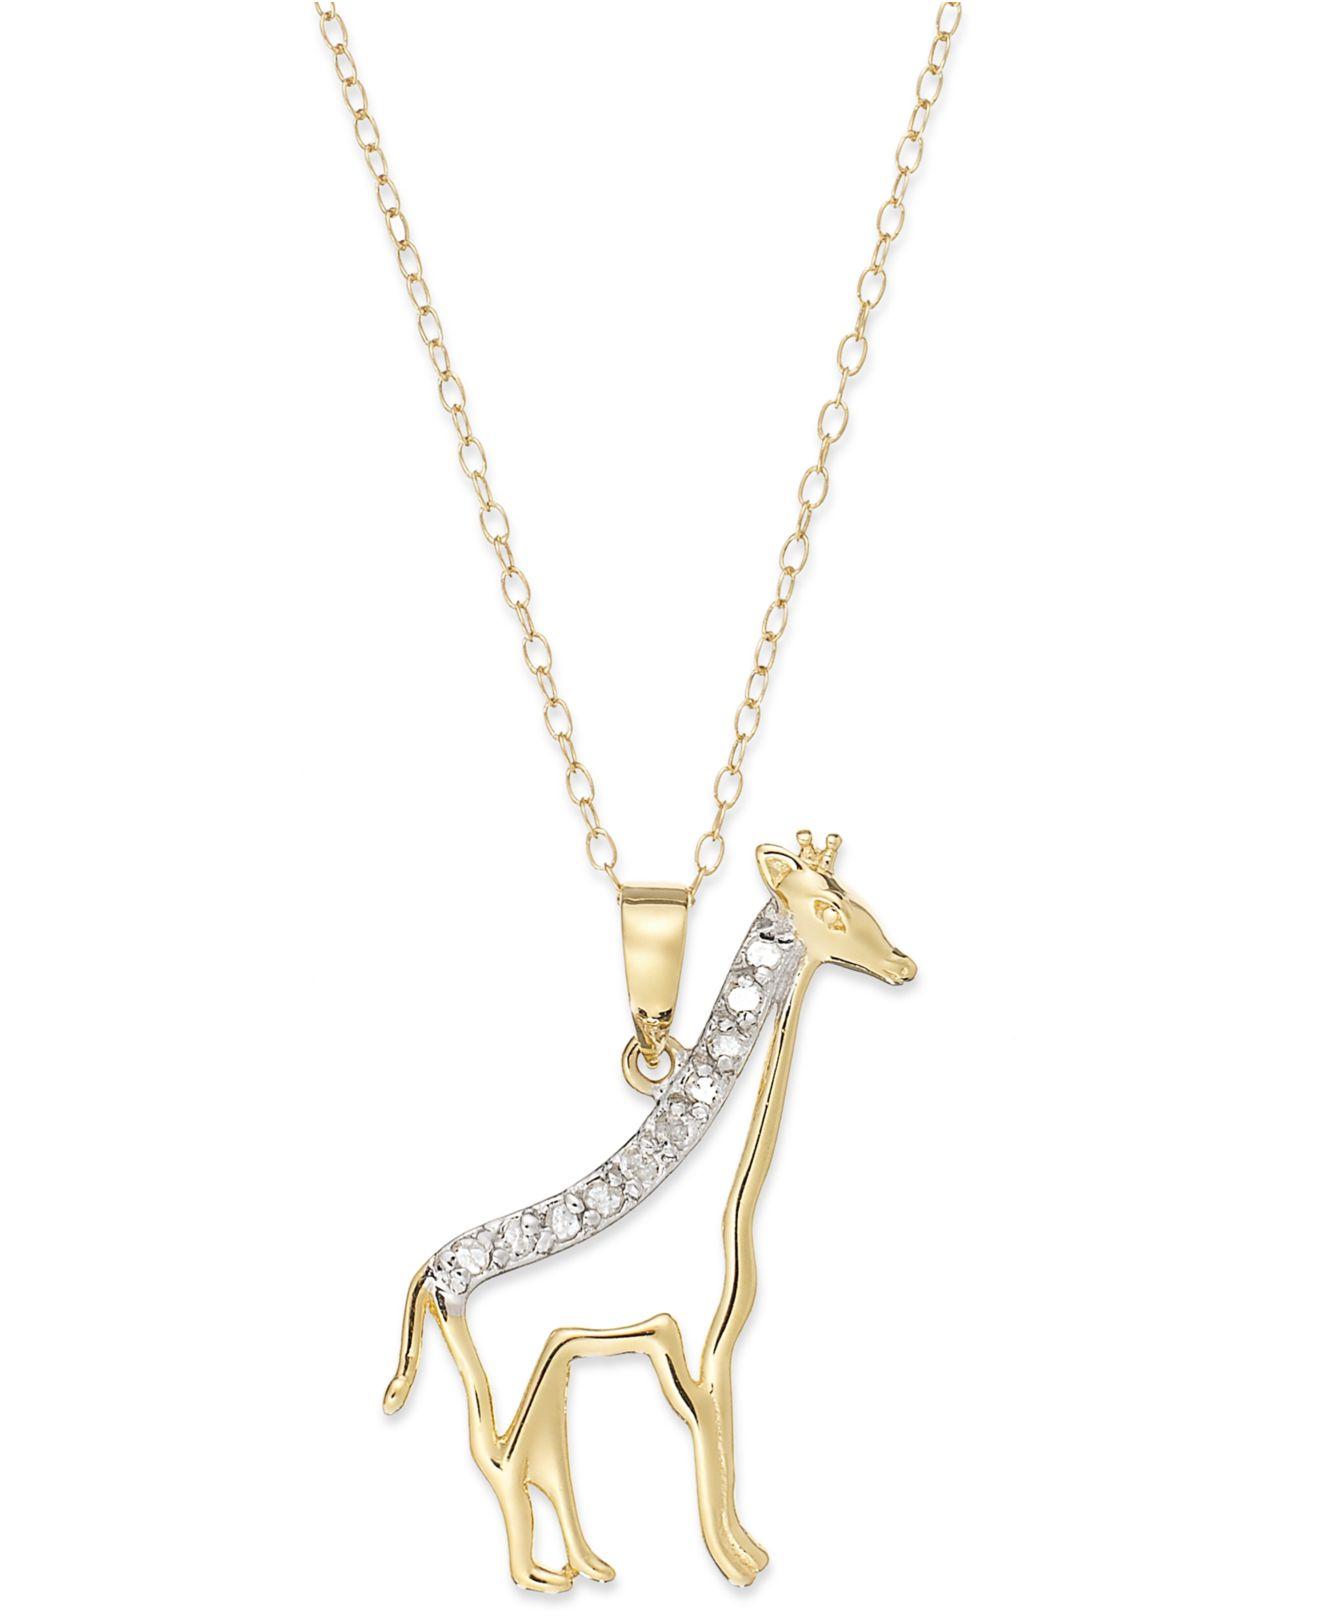 Macy's Diamond Giraffe Pendant Necklace In 18k Gold Over ...